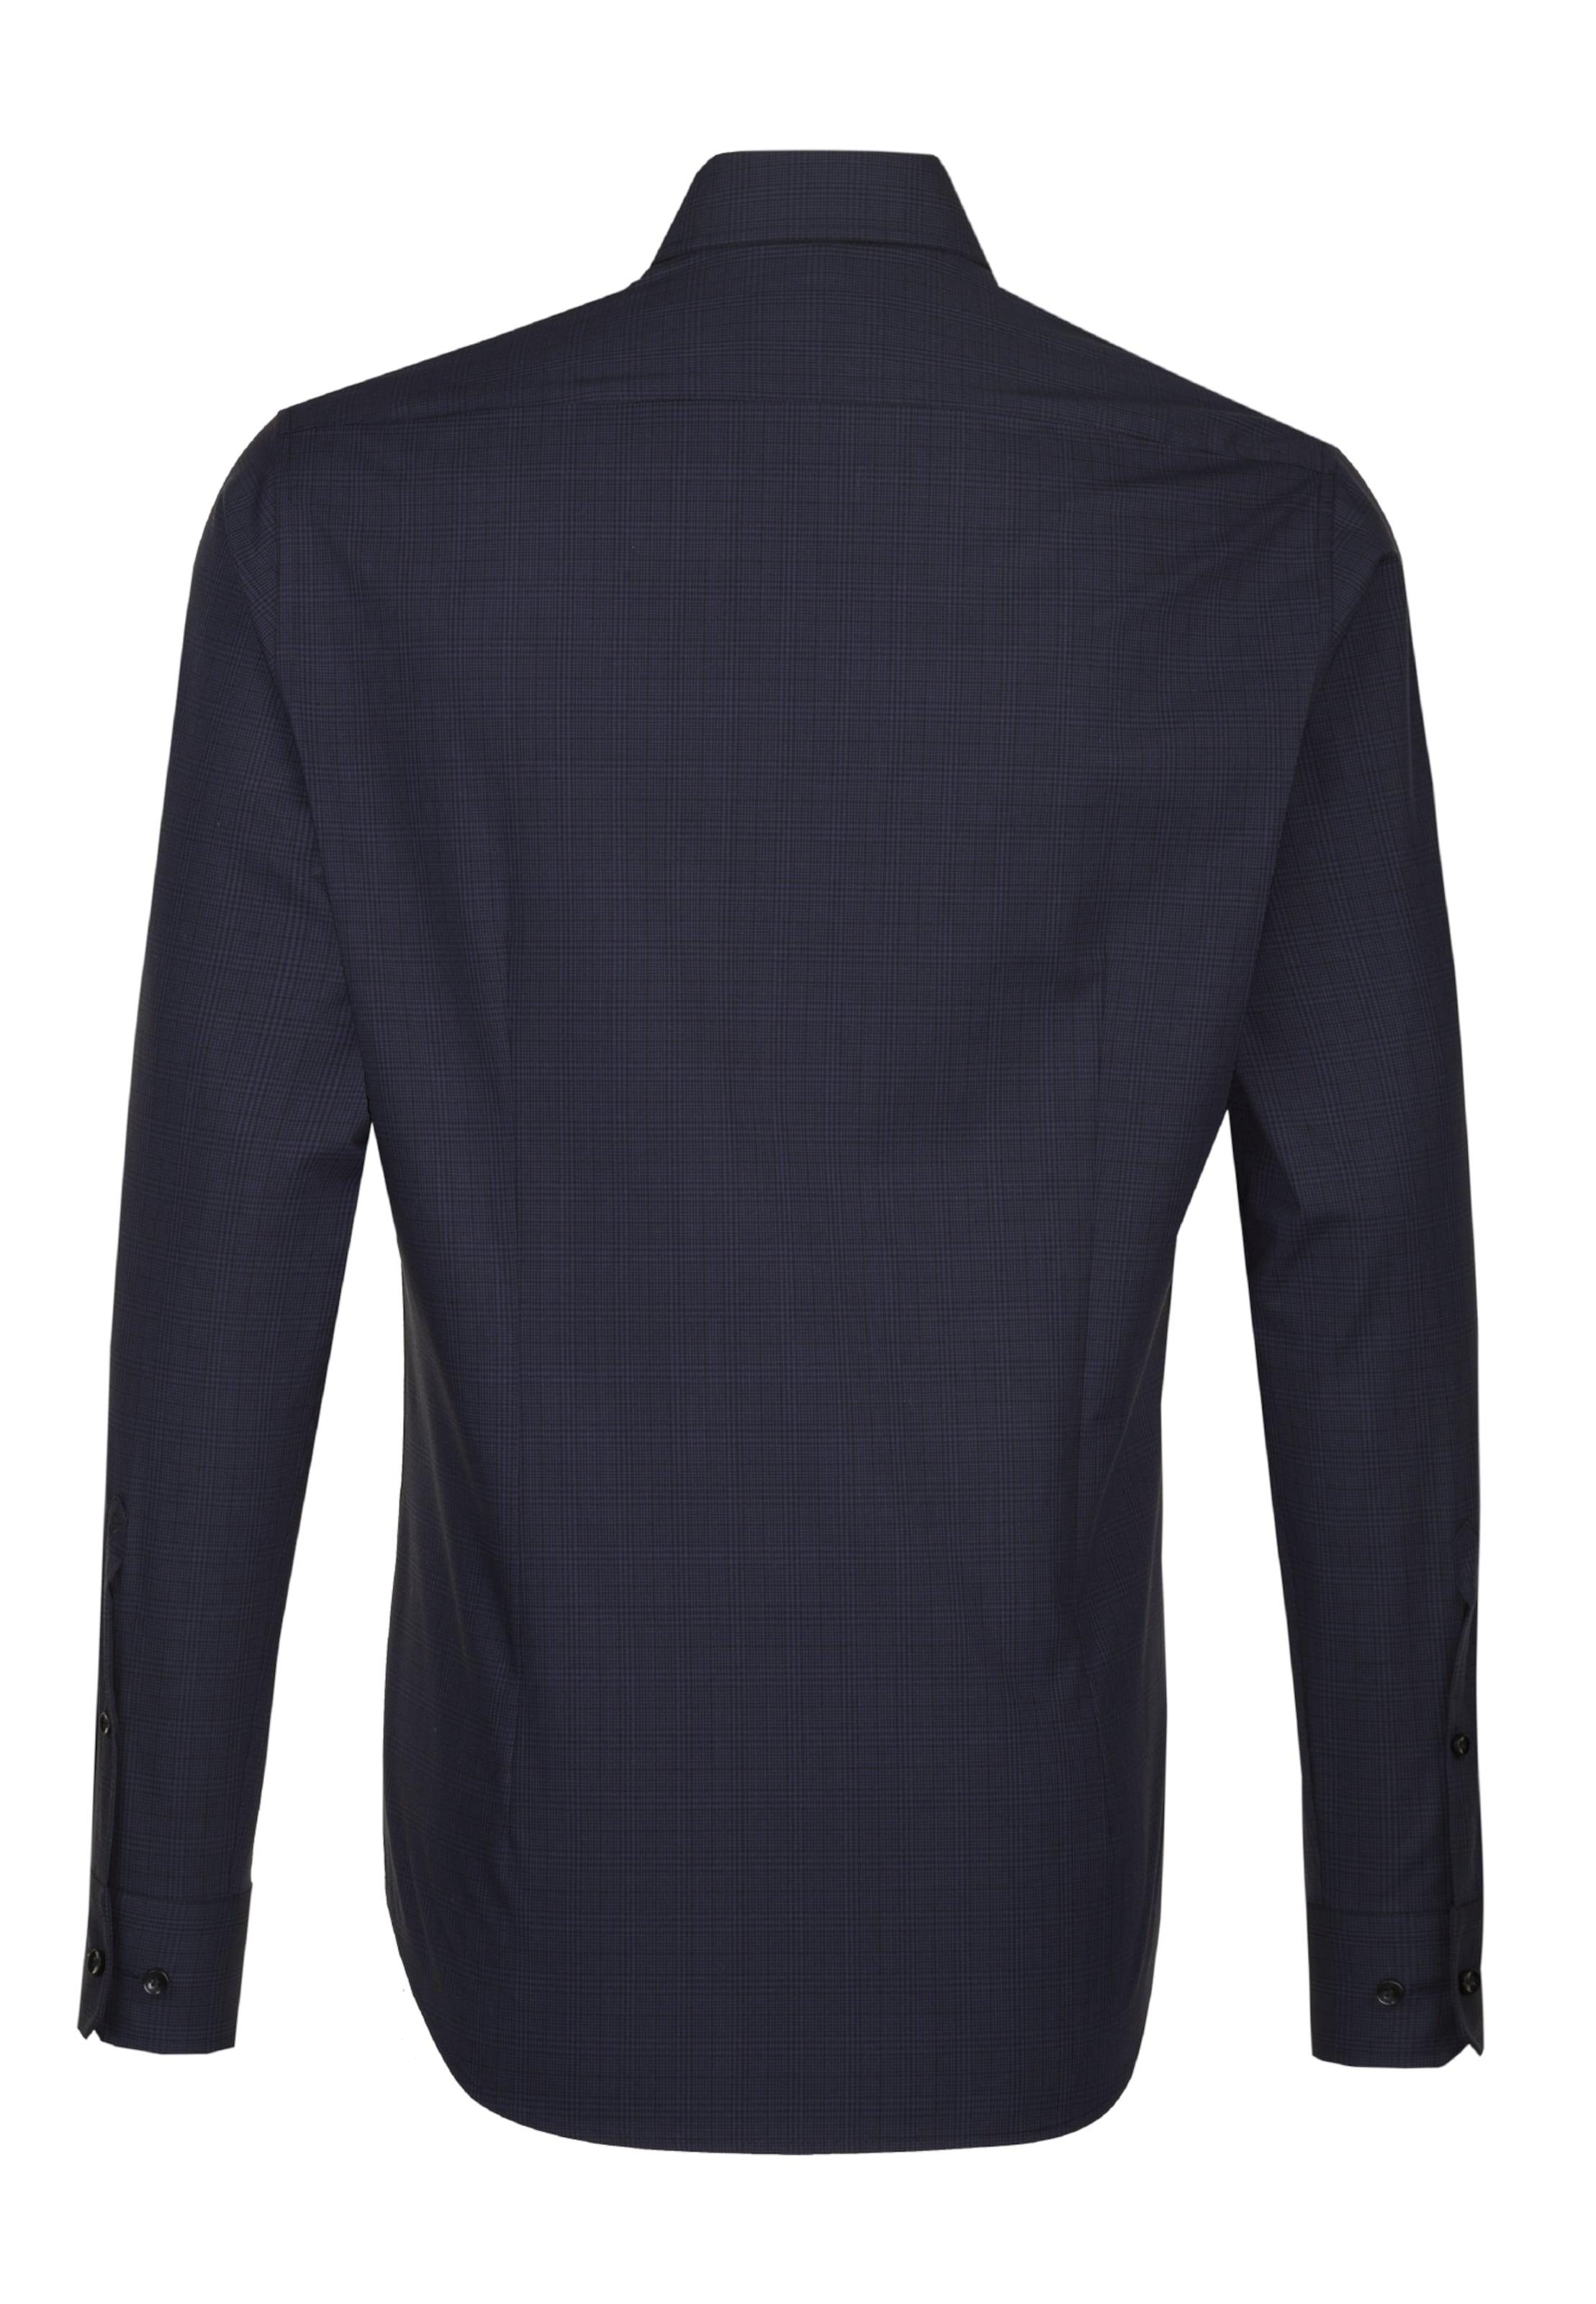 'tailored' In City Navy hemd Seidensticker Pkw8XO0n